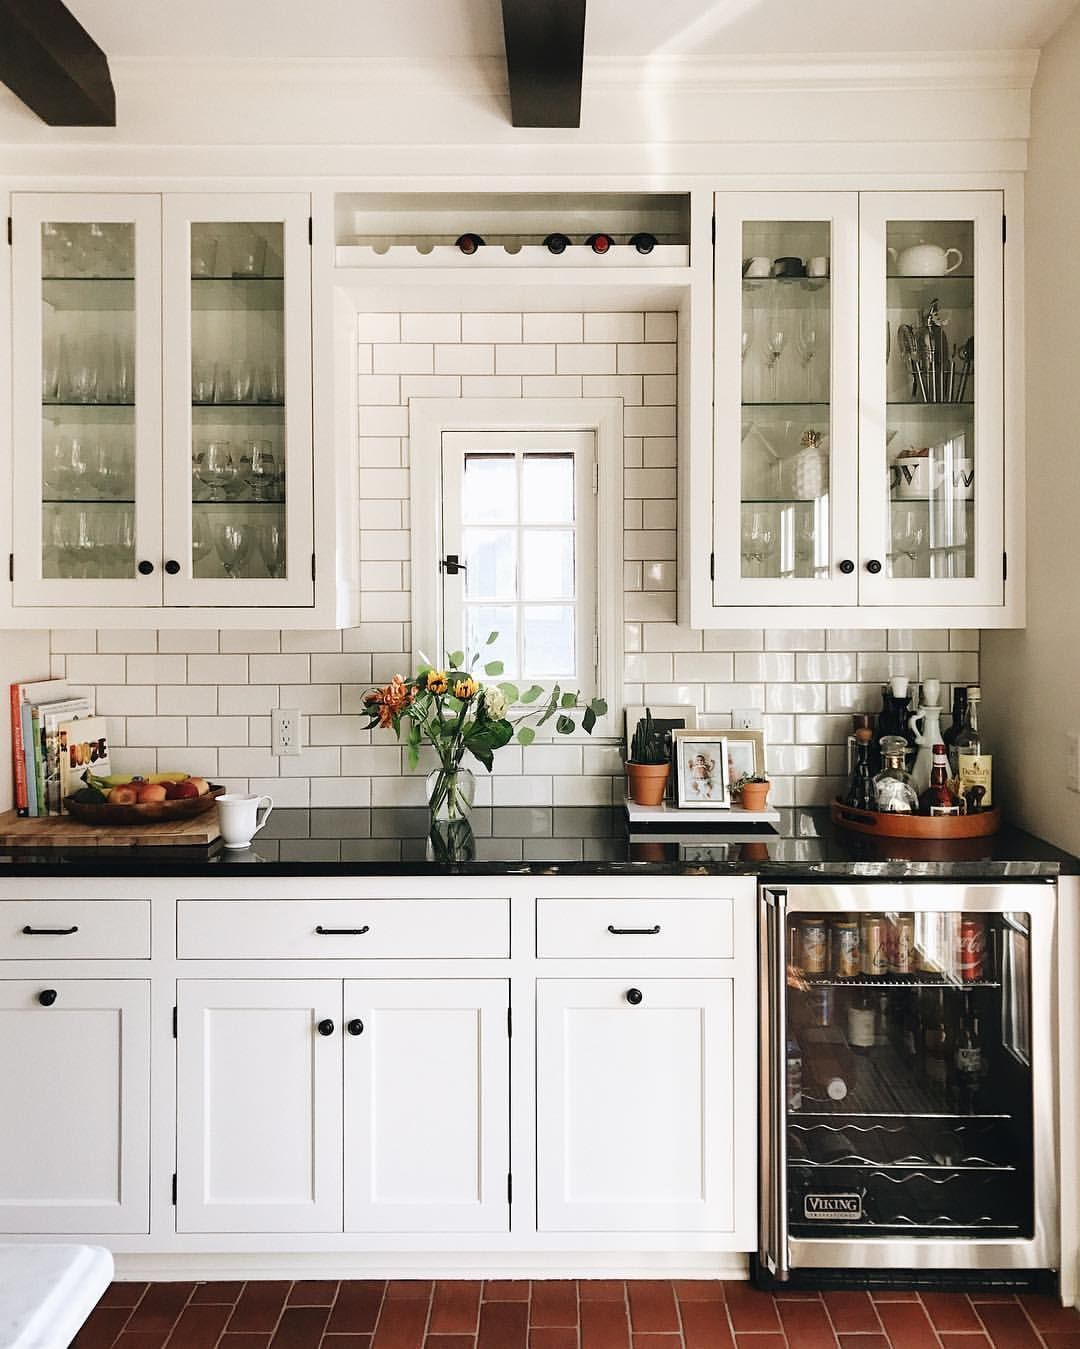 Pin de Stephanie Evans en Kitchen remodel | Pinterest | Cocinas ...